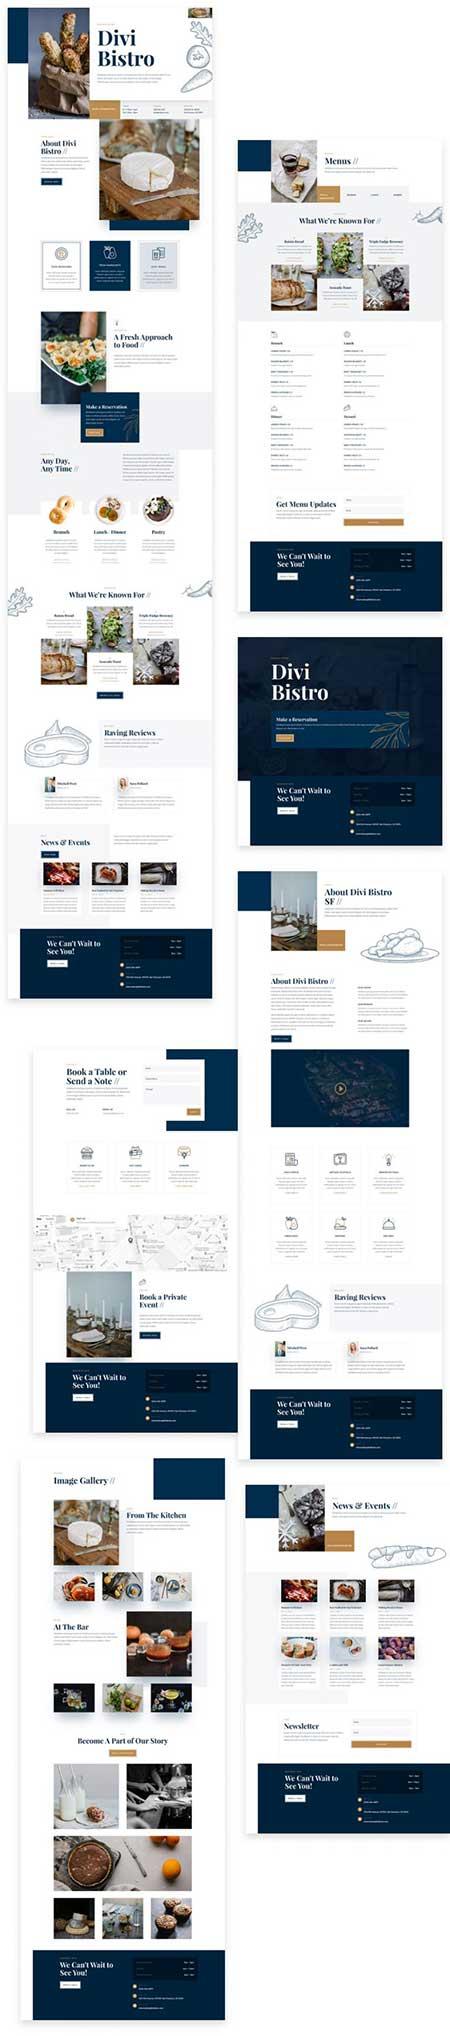 Divi bistro website template